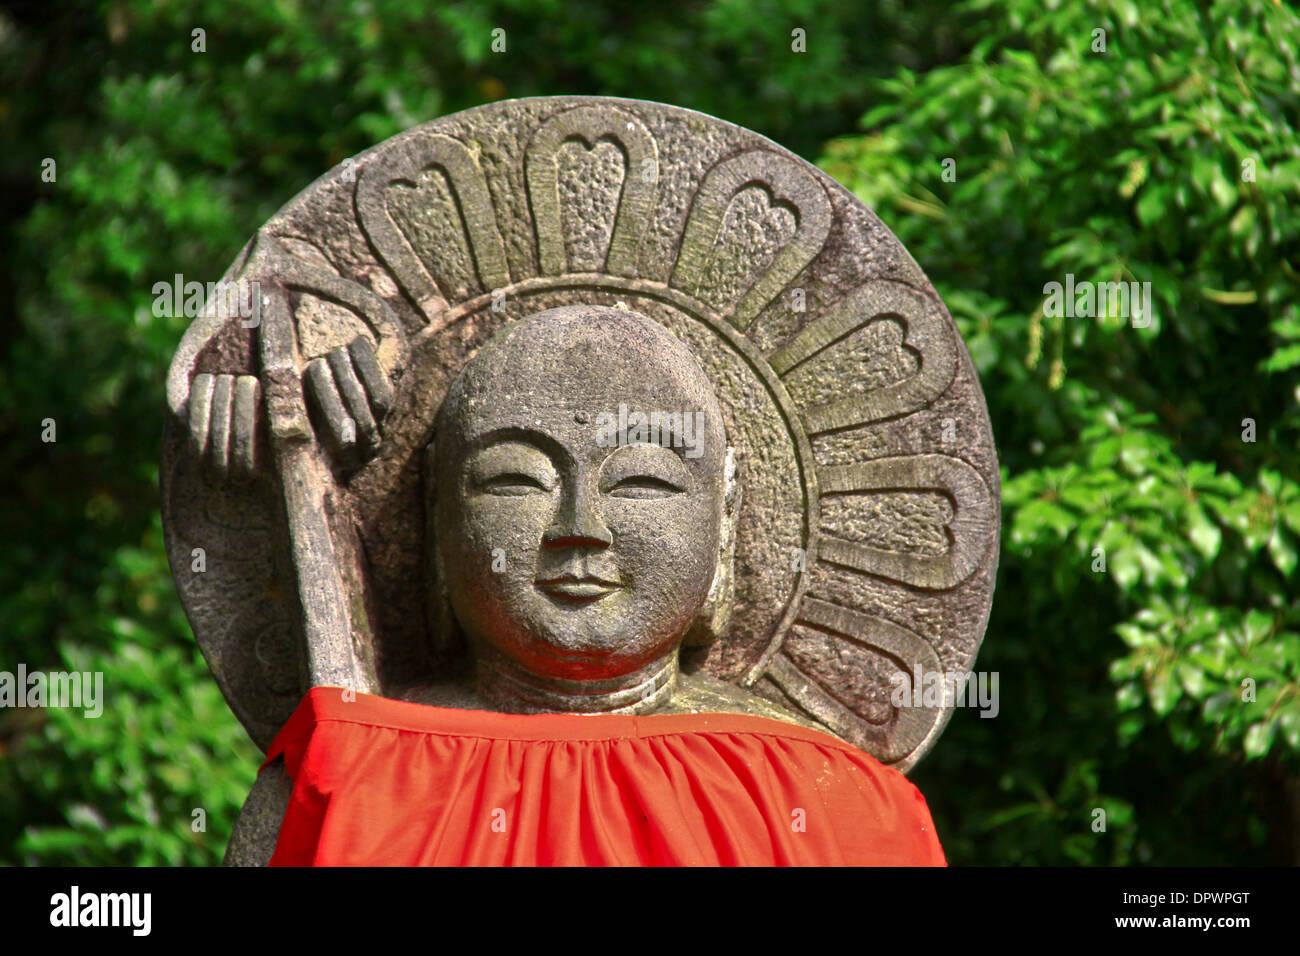 An Ojizo-sama statue, dressed in a red bib, near Todaiji Temple, Nara Park, Japan. - Stock Image